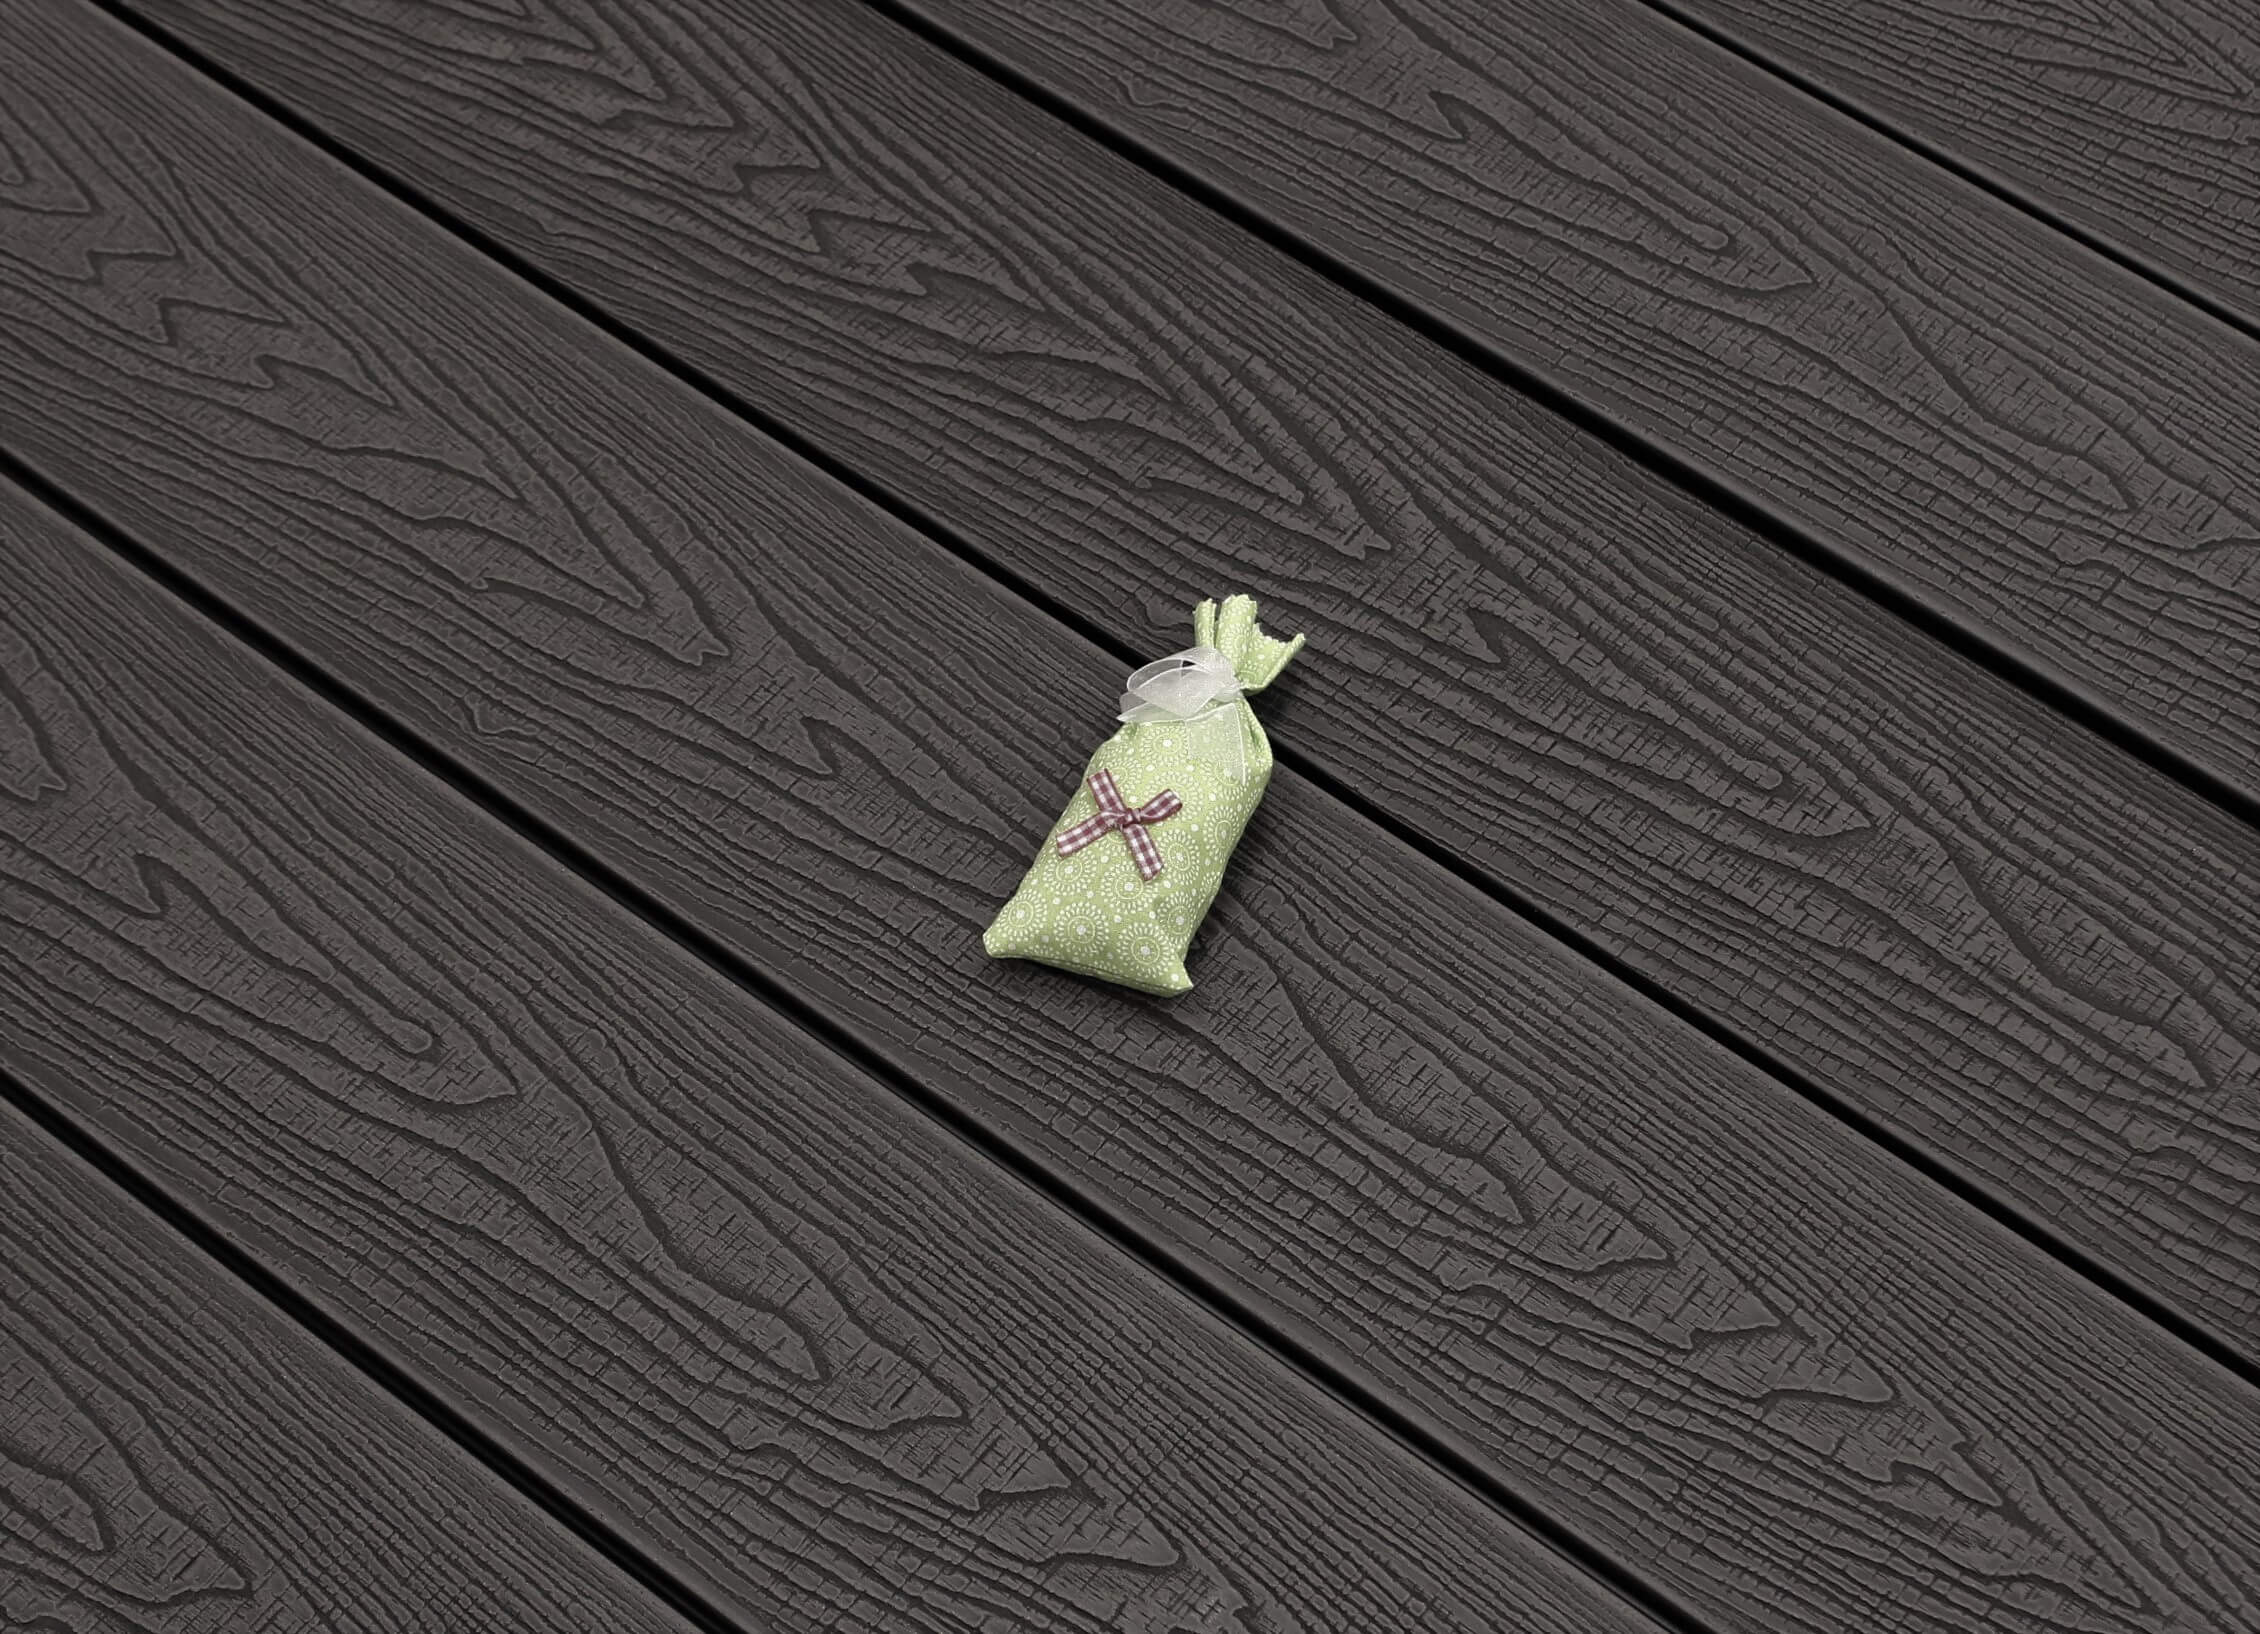 WPC Terrasse massiv, dunkelgrau, Oberfläche mit Struktur in Holzoptik sägerau, 22 x 143 bis 4800 mm, Vollprofil, 7,95 €/lfm